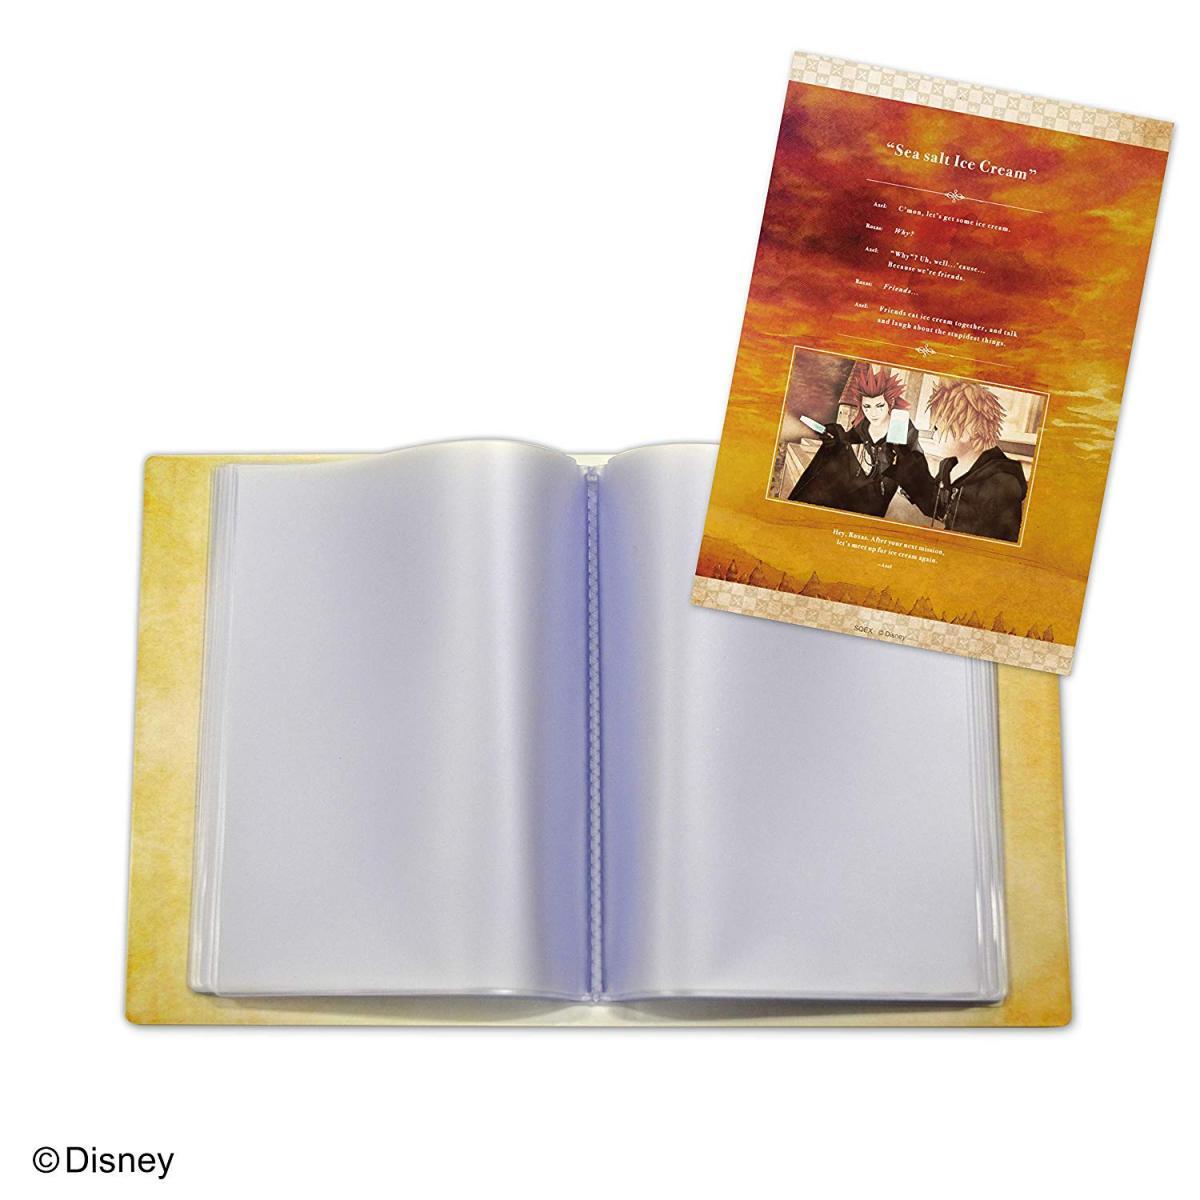 PostcarBookTwi3.jpg